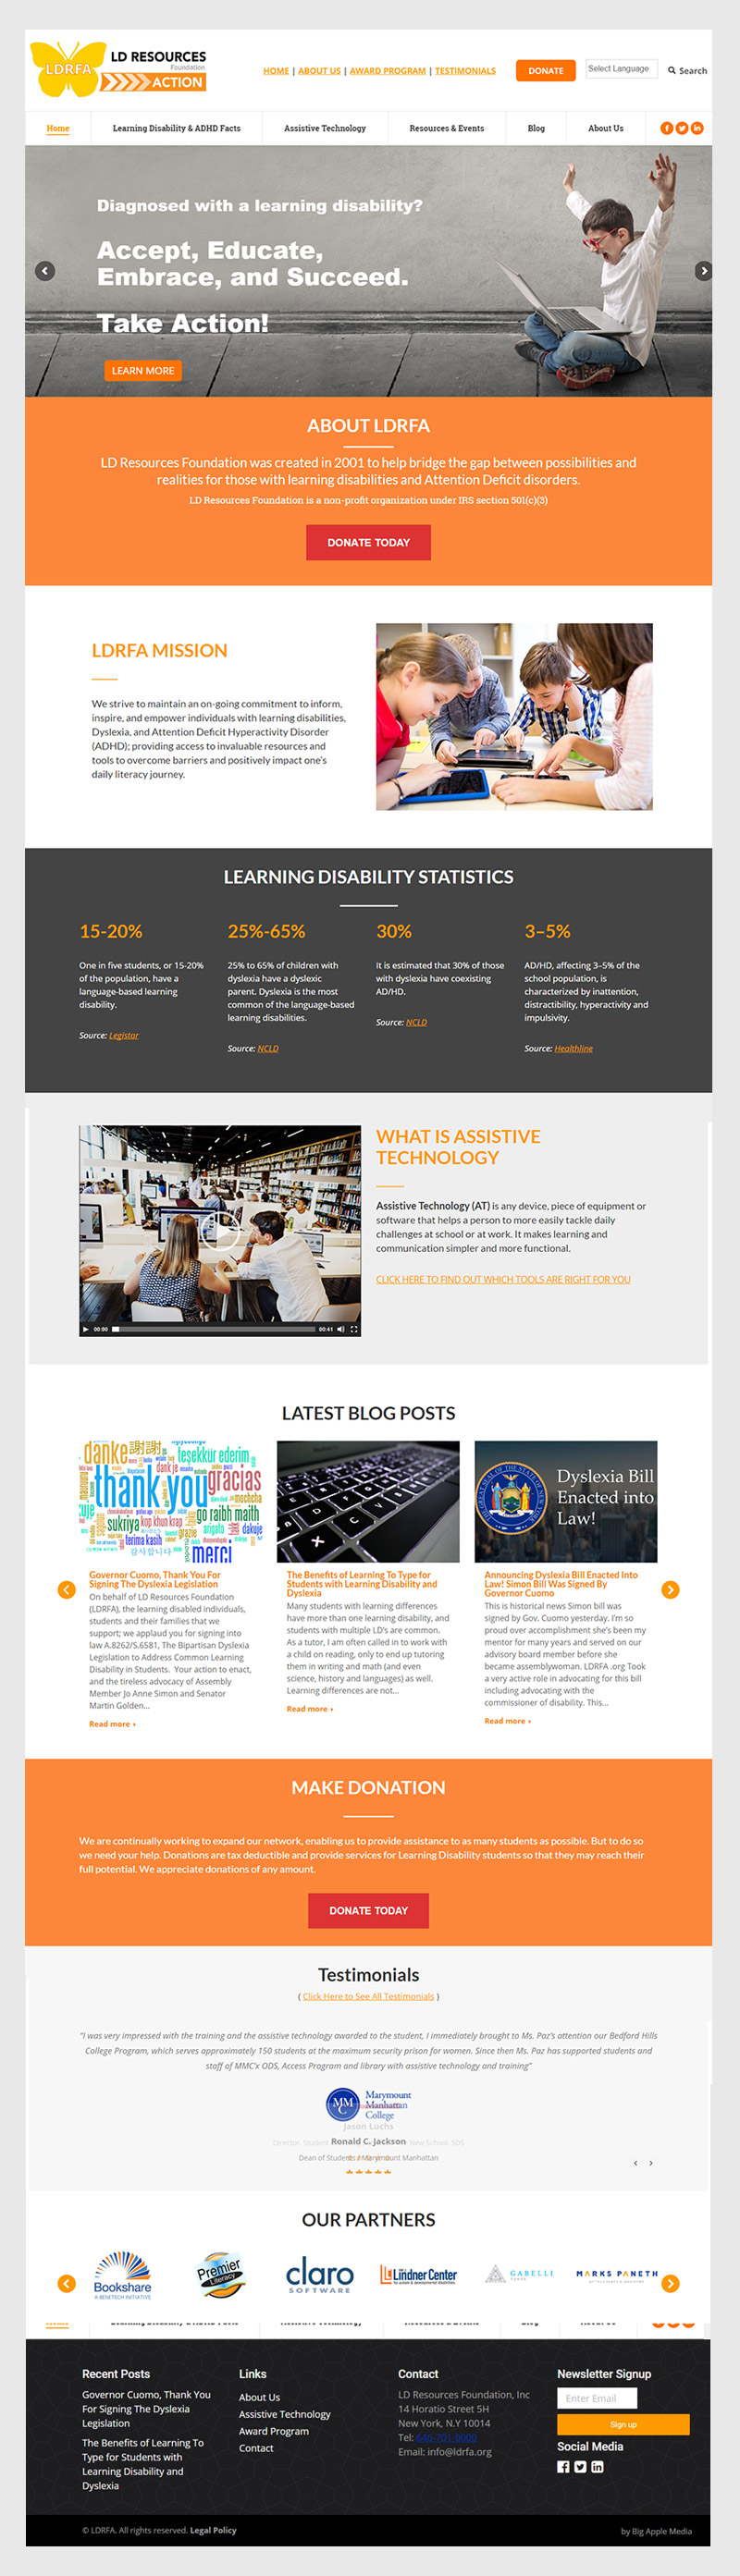 new non-profit website